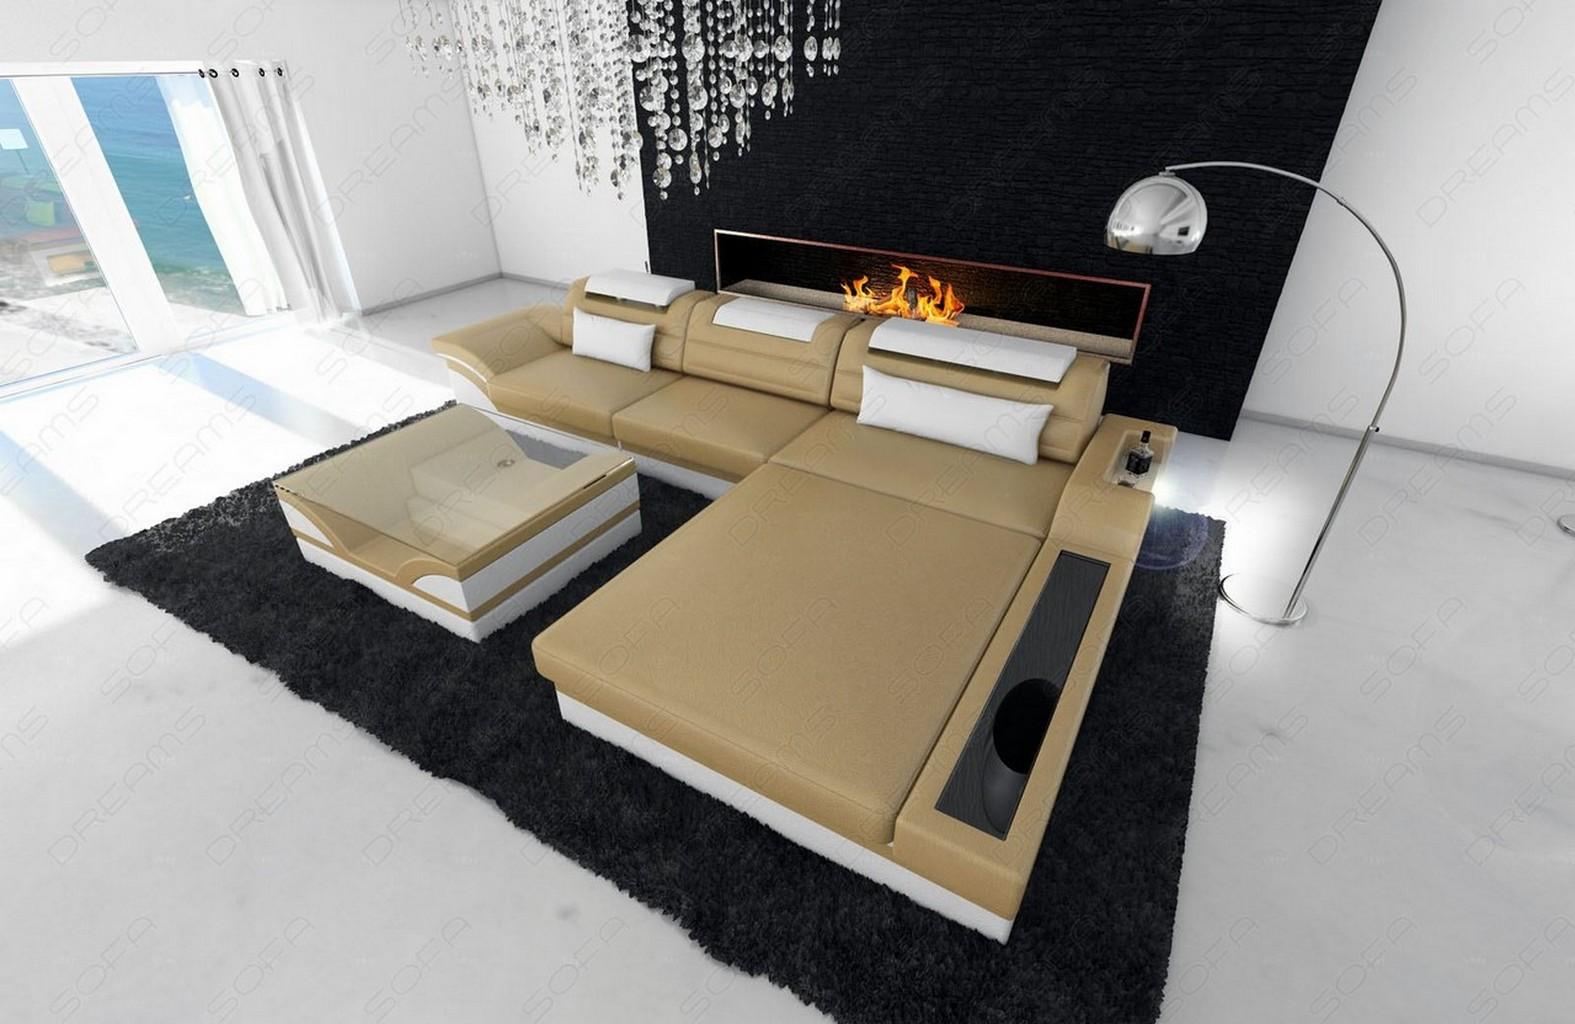 Details about Leather Sectional Sofa Orlando L Shape LED lights Design Sofa  Luxury